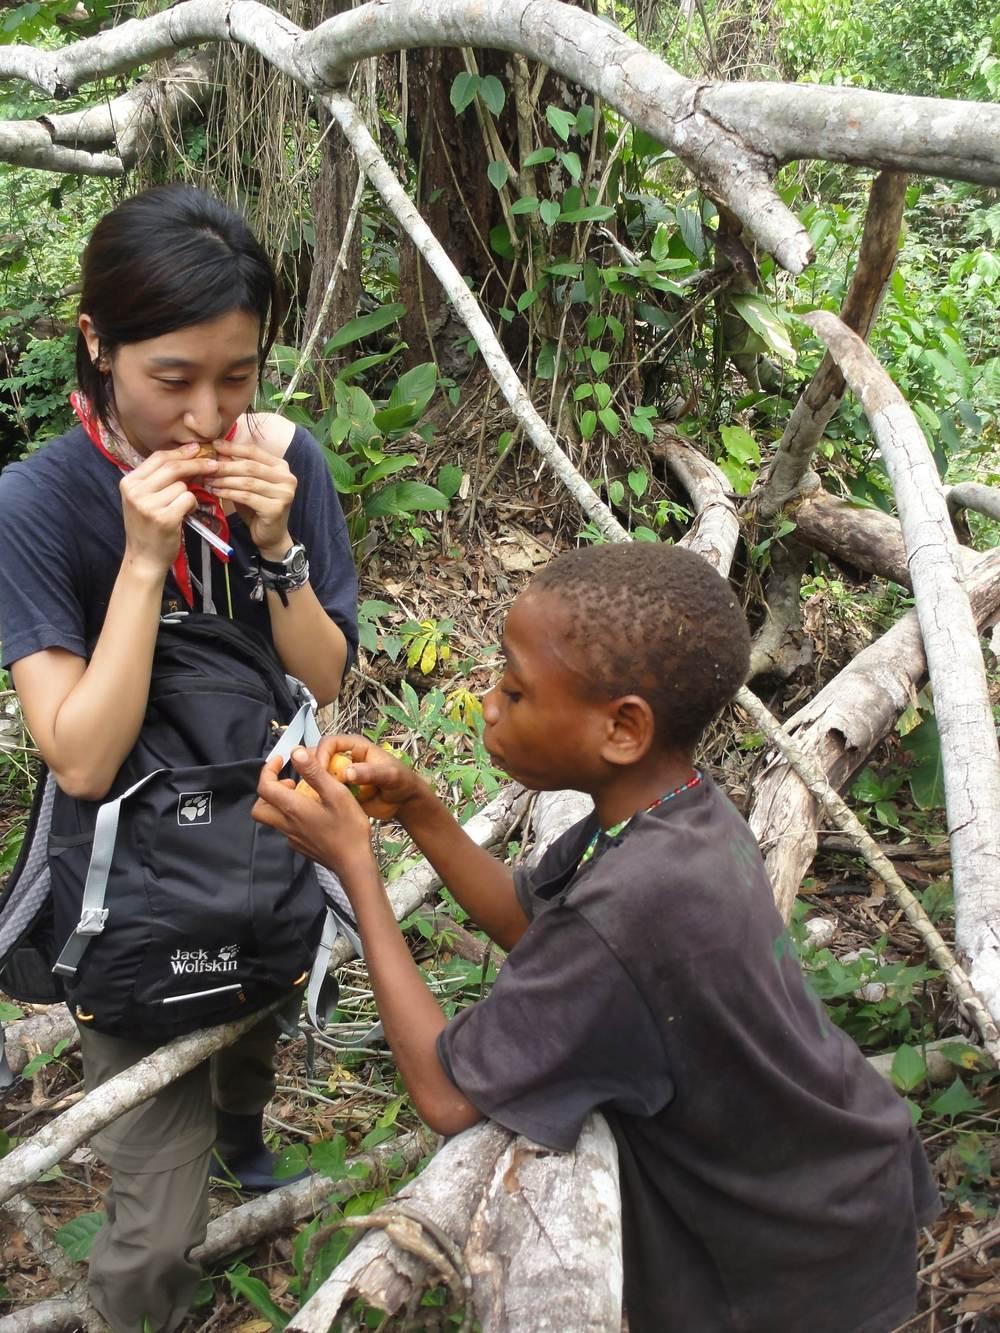 PhD student Haneul Jang (L) and Kuona eating fruit. Photo credit: Karline Janmaat